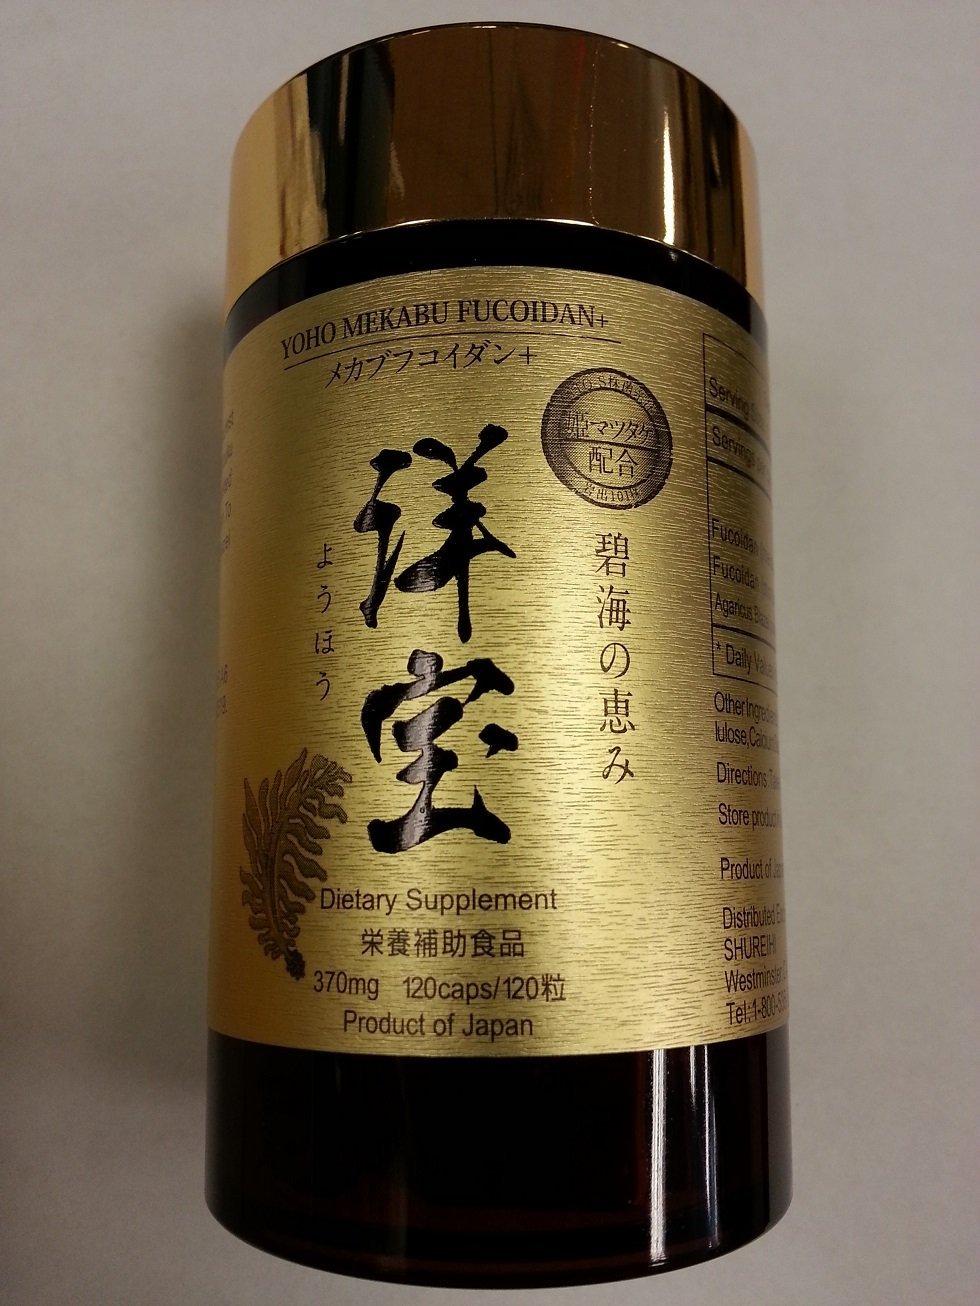 yoho-mekabu-fucoidan-2